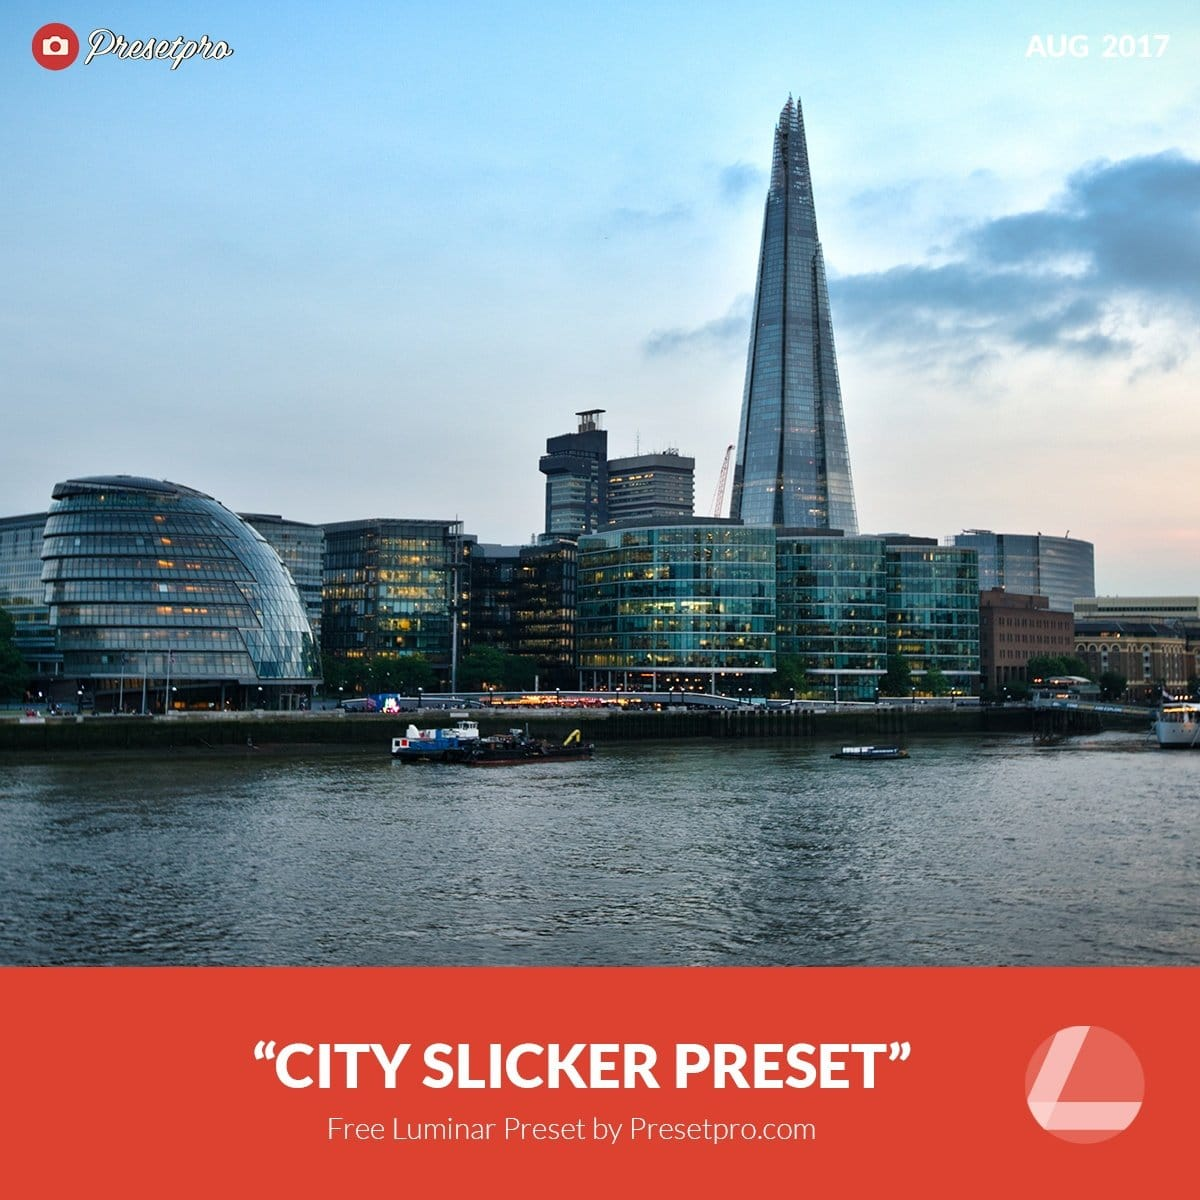 Free-Luminar-Preset-City-Slicker-Presetpro.com